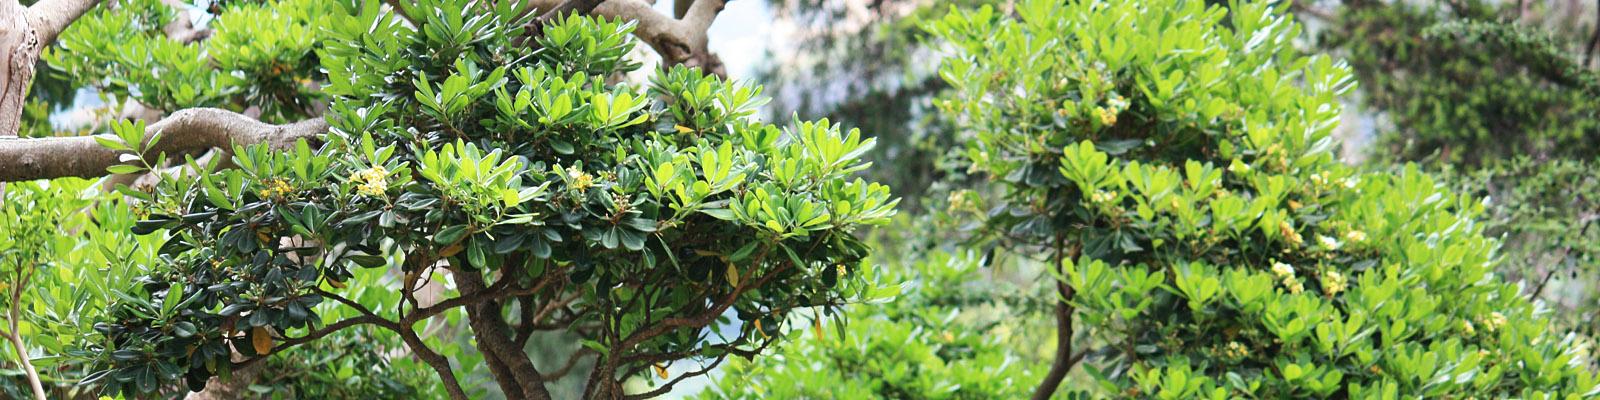 Green Parrot Gardens   Topiary, Cloud Pruning and Garden Bonsais